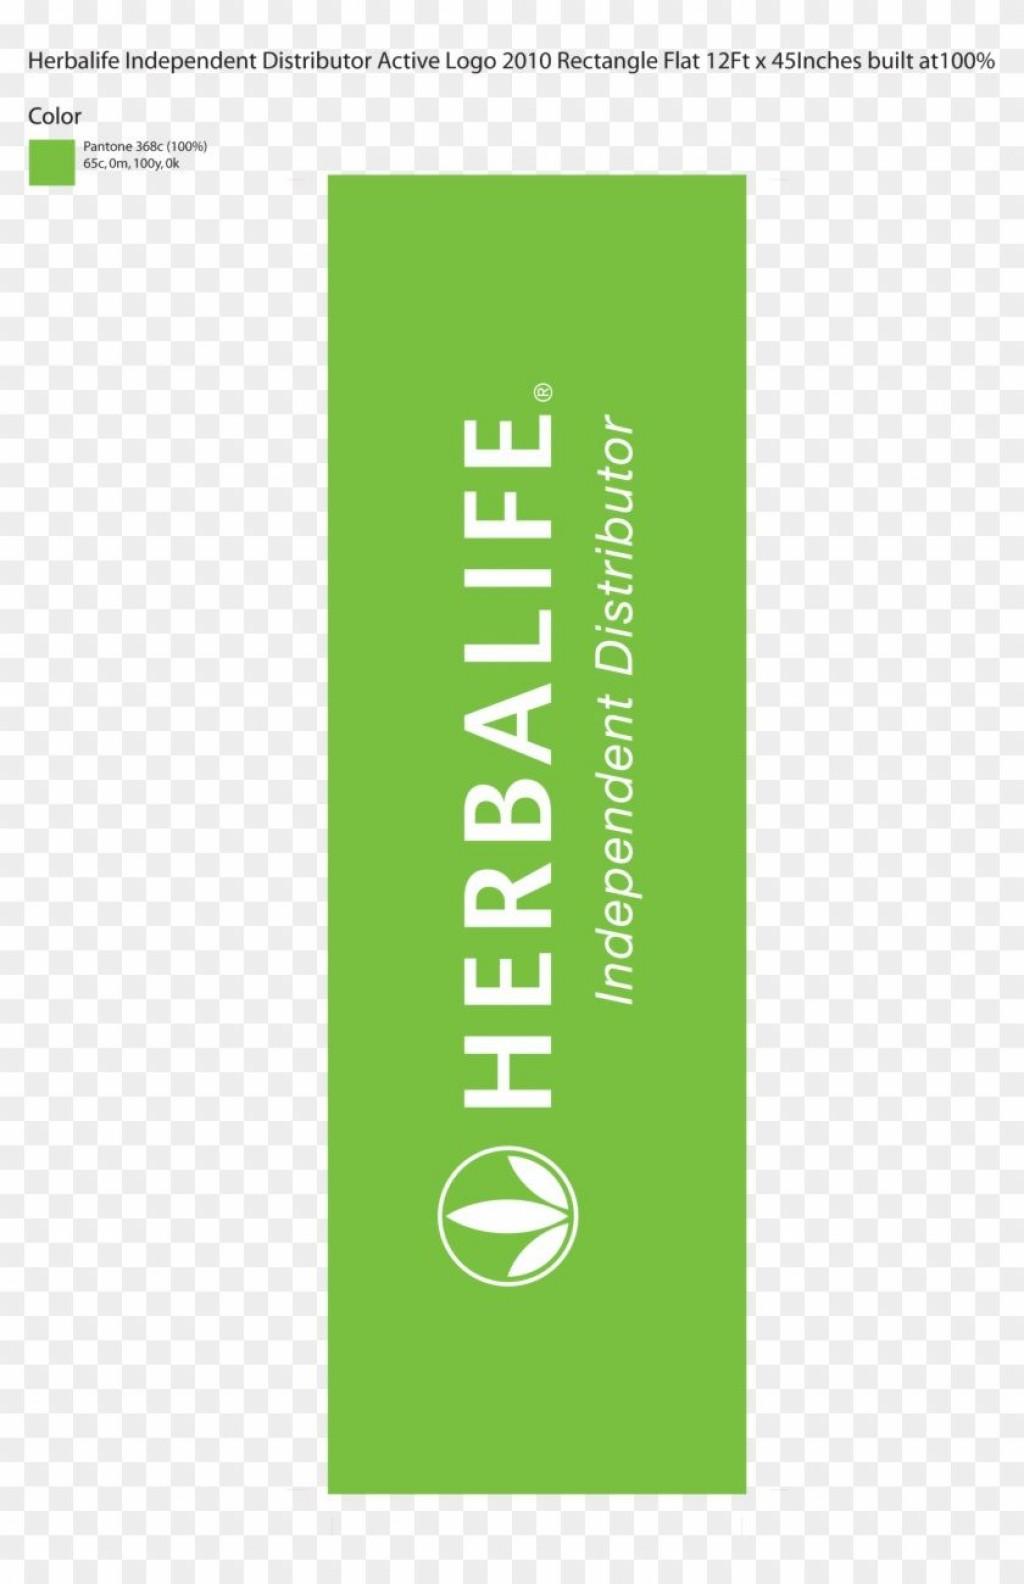 005 Singular Herbalife Busines Card Template Highest Quality  Download FreeLarge